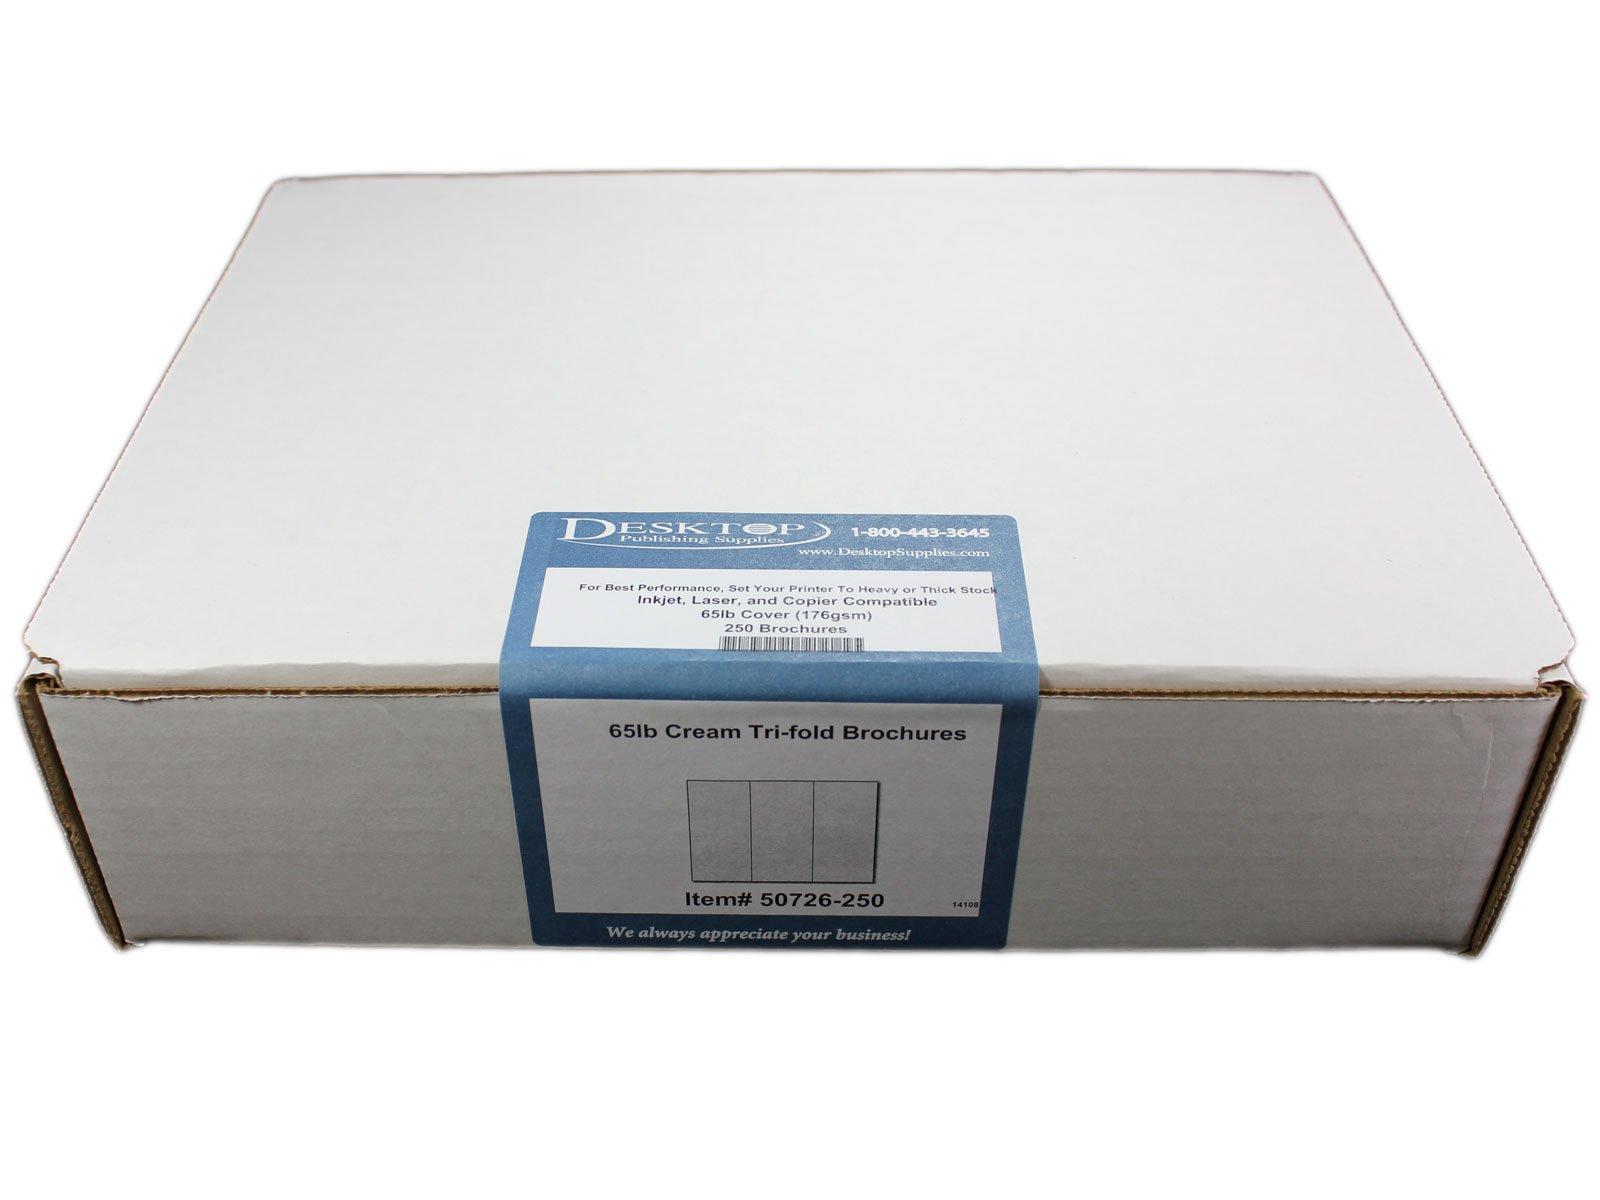 65lb Off White/Cream Tri-fold Brochures - 250 Brochures - Desktop Publishing Supplies, Inc. Brand by Desktop Publishing Supplies, Inc.